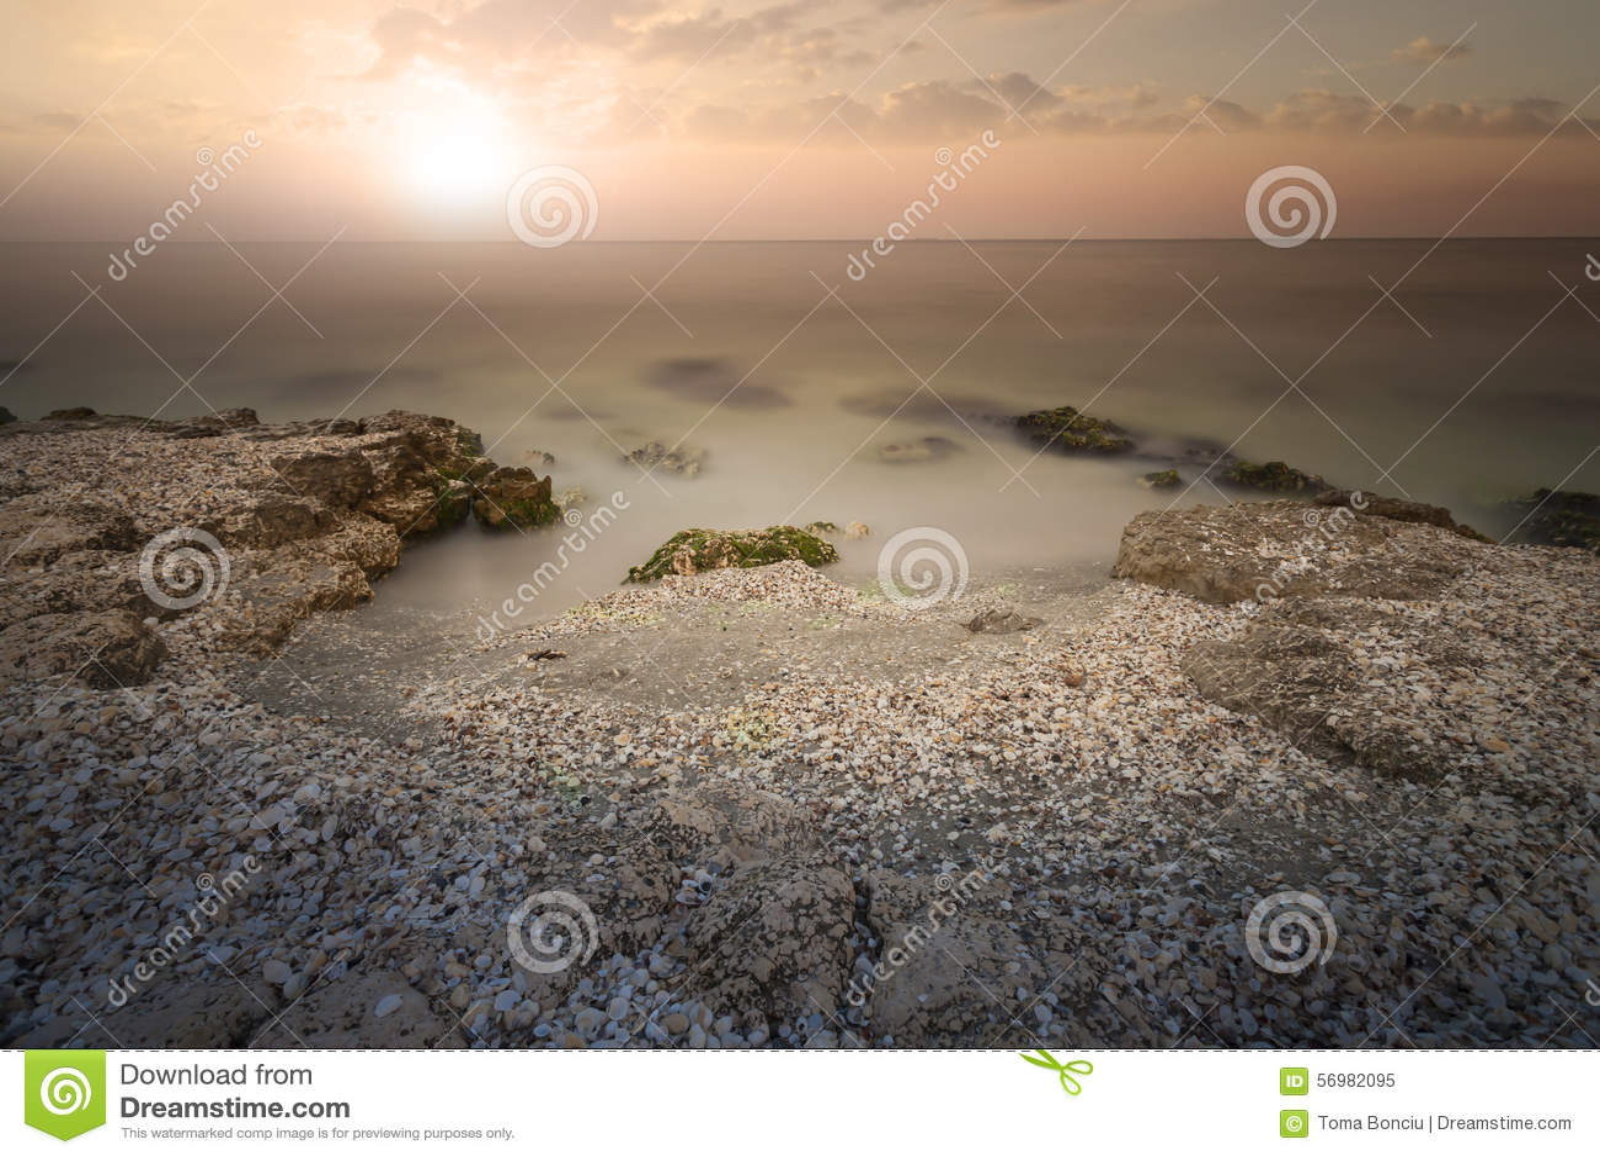 sunset on sea bright sun on sky stock image image 56982095. Black Bedroom Furniture Sets. Home Design Ideas